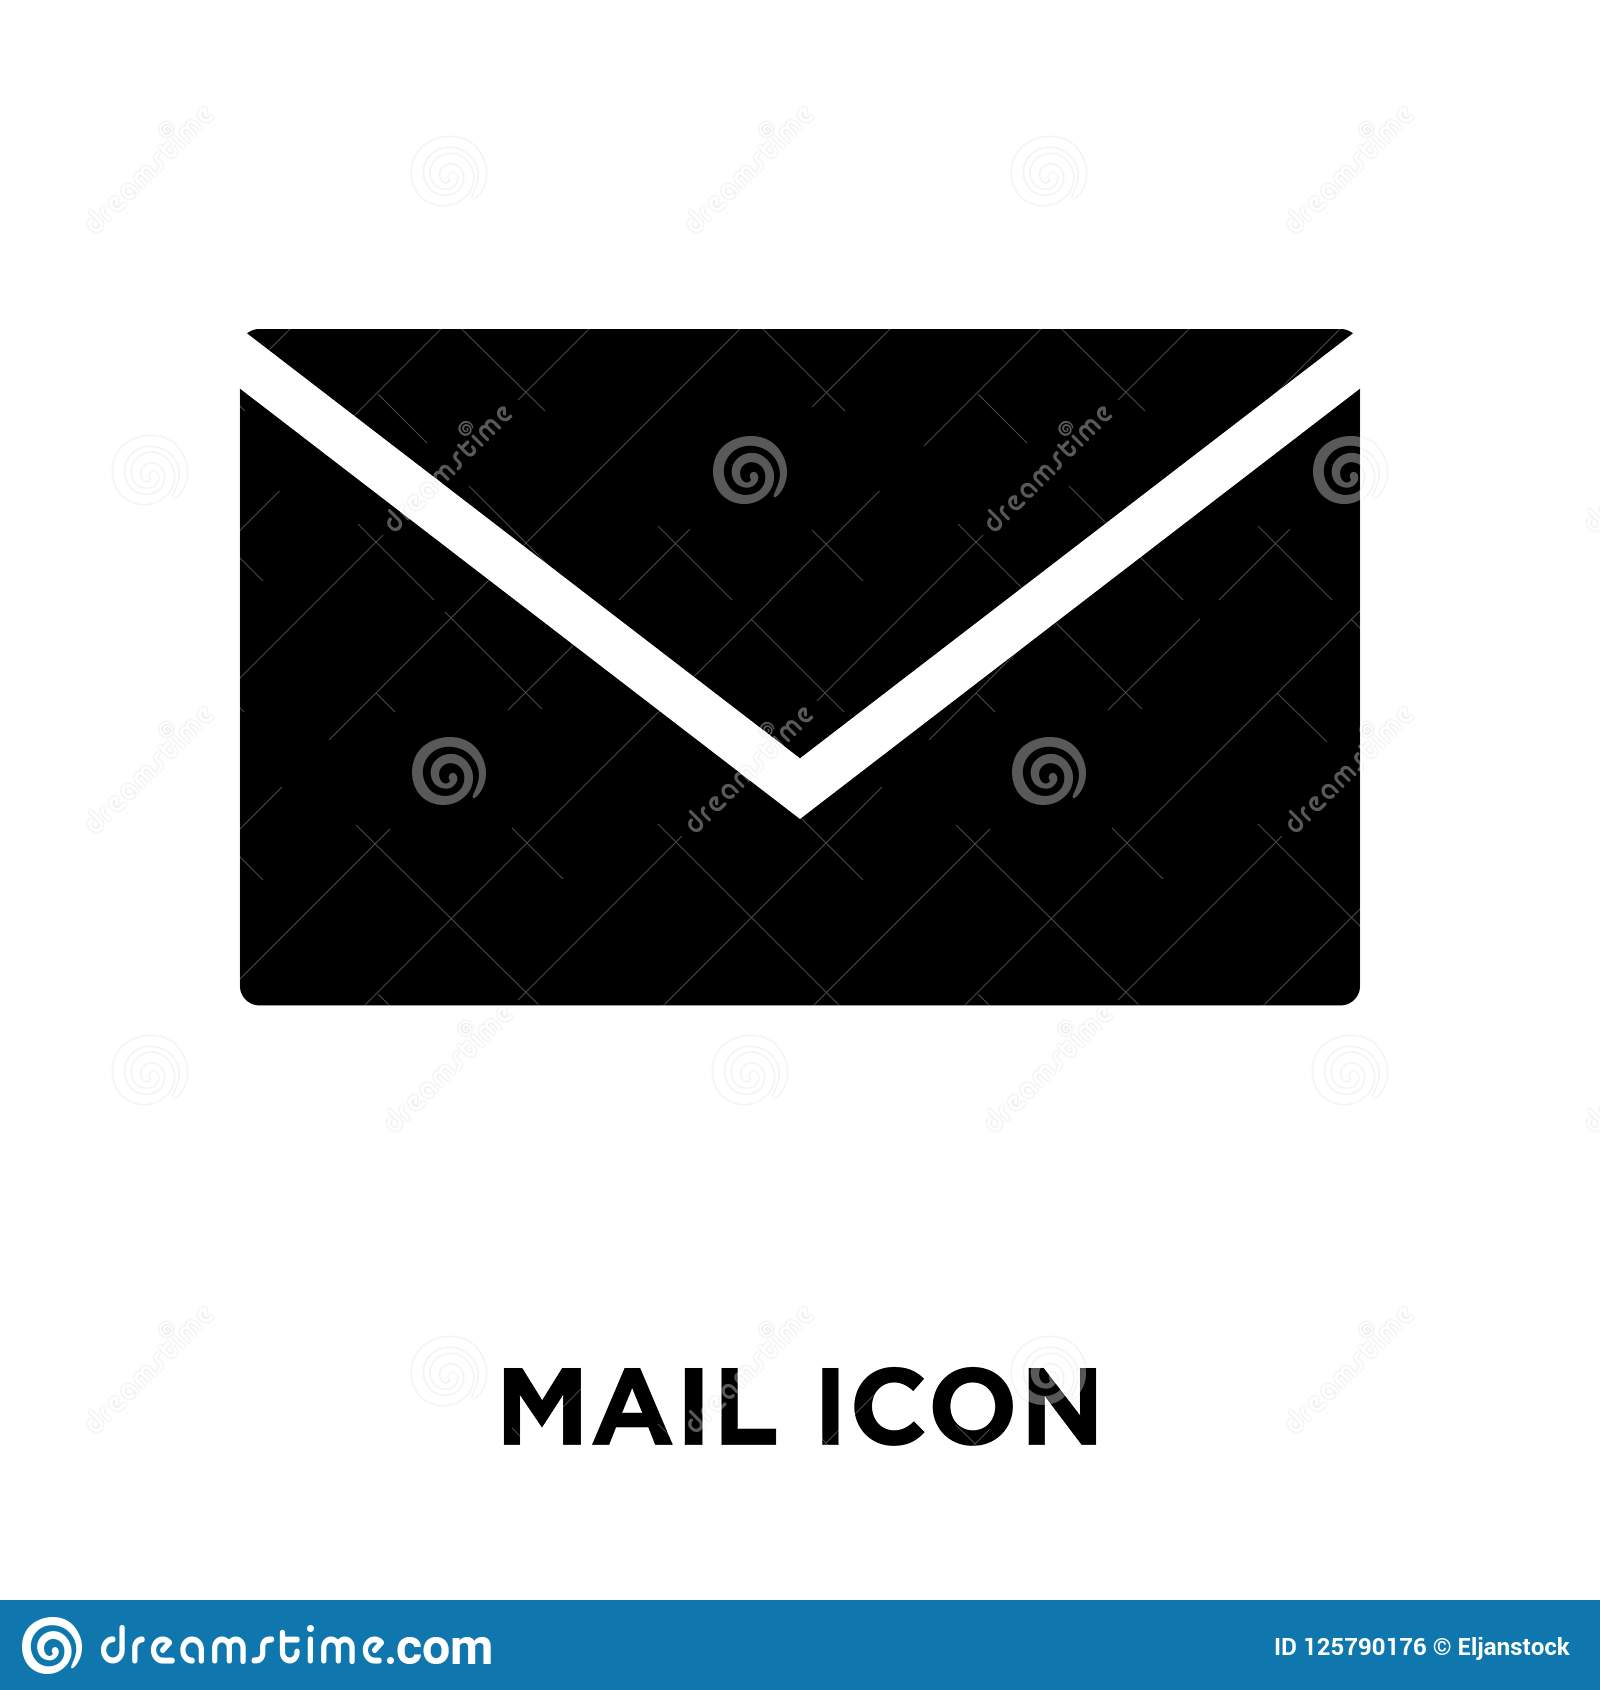 Envie o vetor do ícone isolado no fundo branco, conceito do logotipo de M